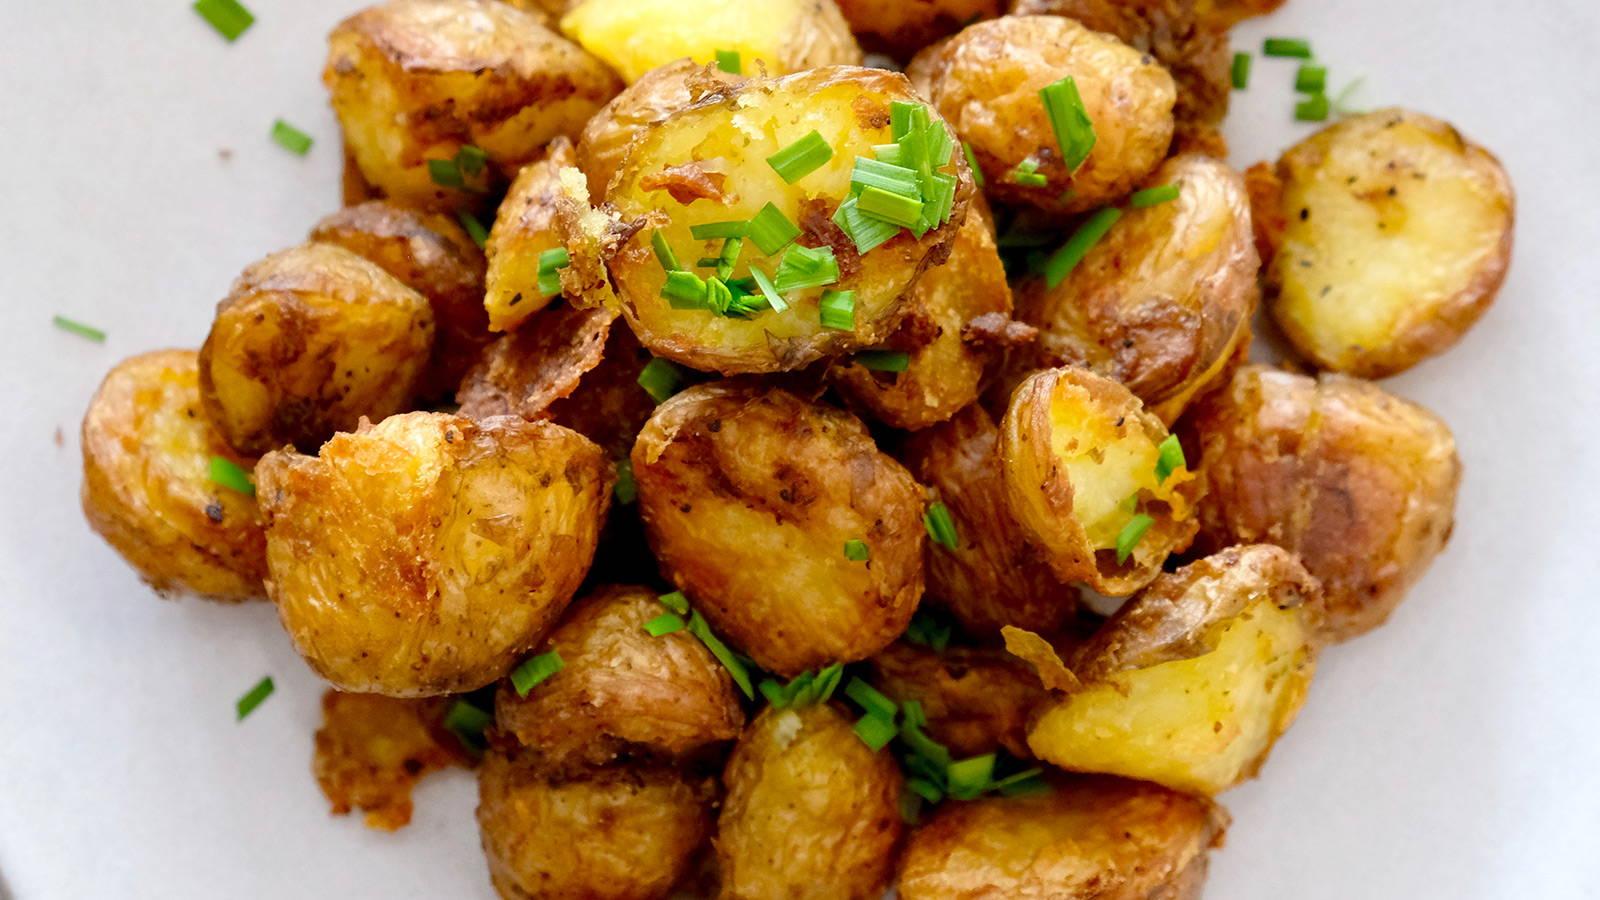 Low FODMAP Crispy Roasted Baby Potatoes